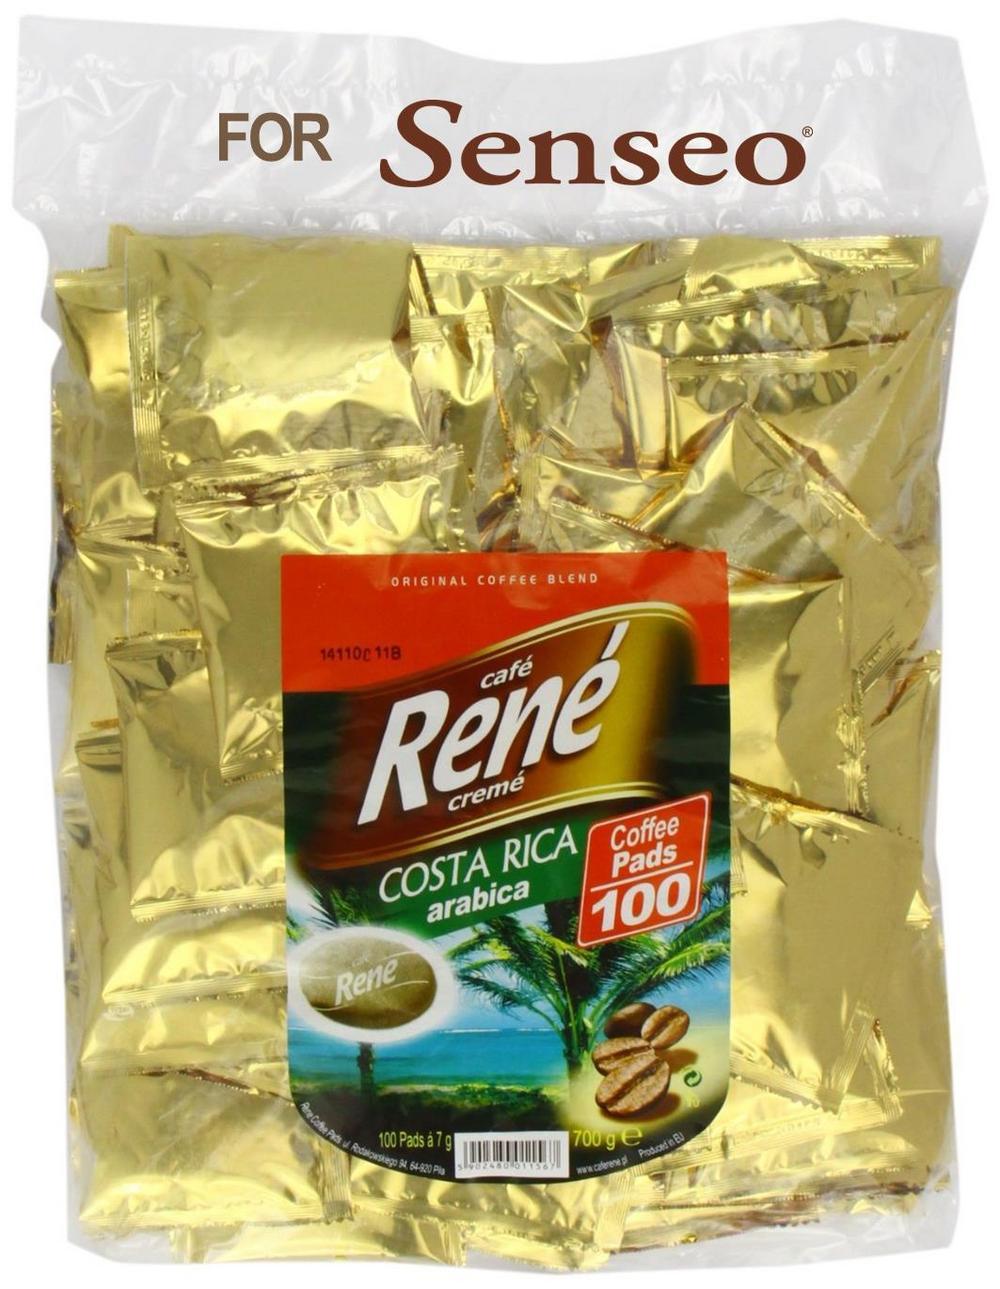 Philips Senseo 100 x Café Rene Crème Costa Rica Coffee Pads Bags Pods